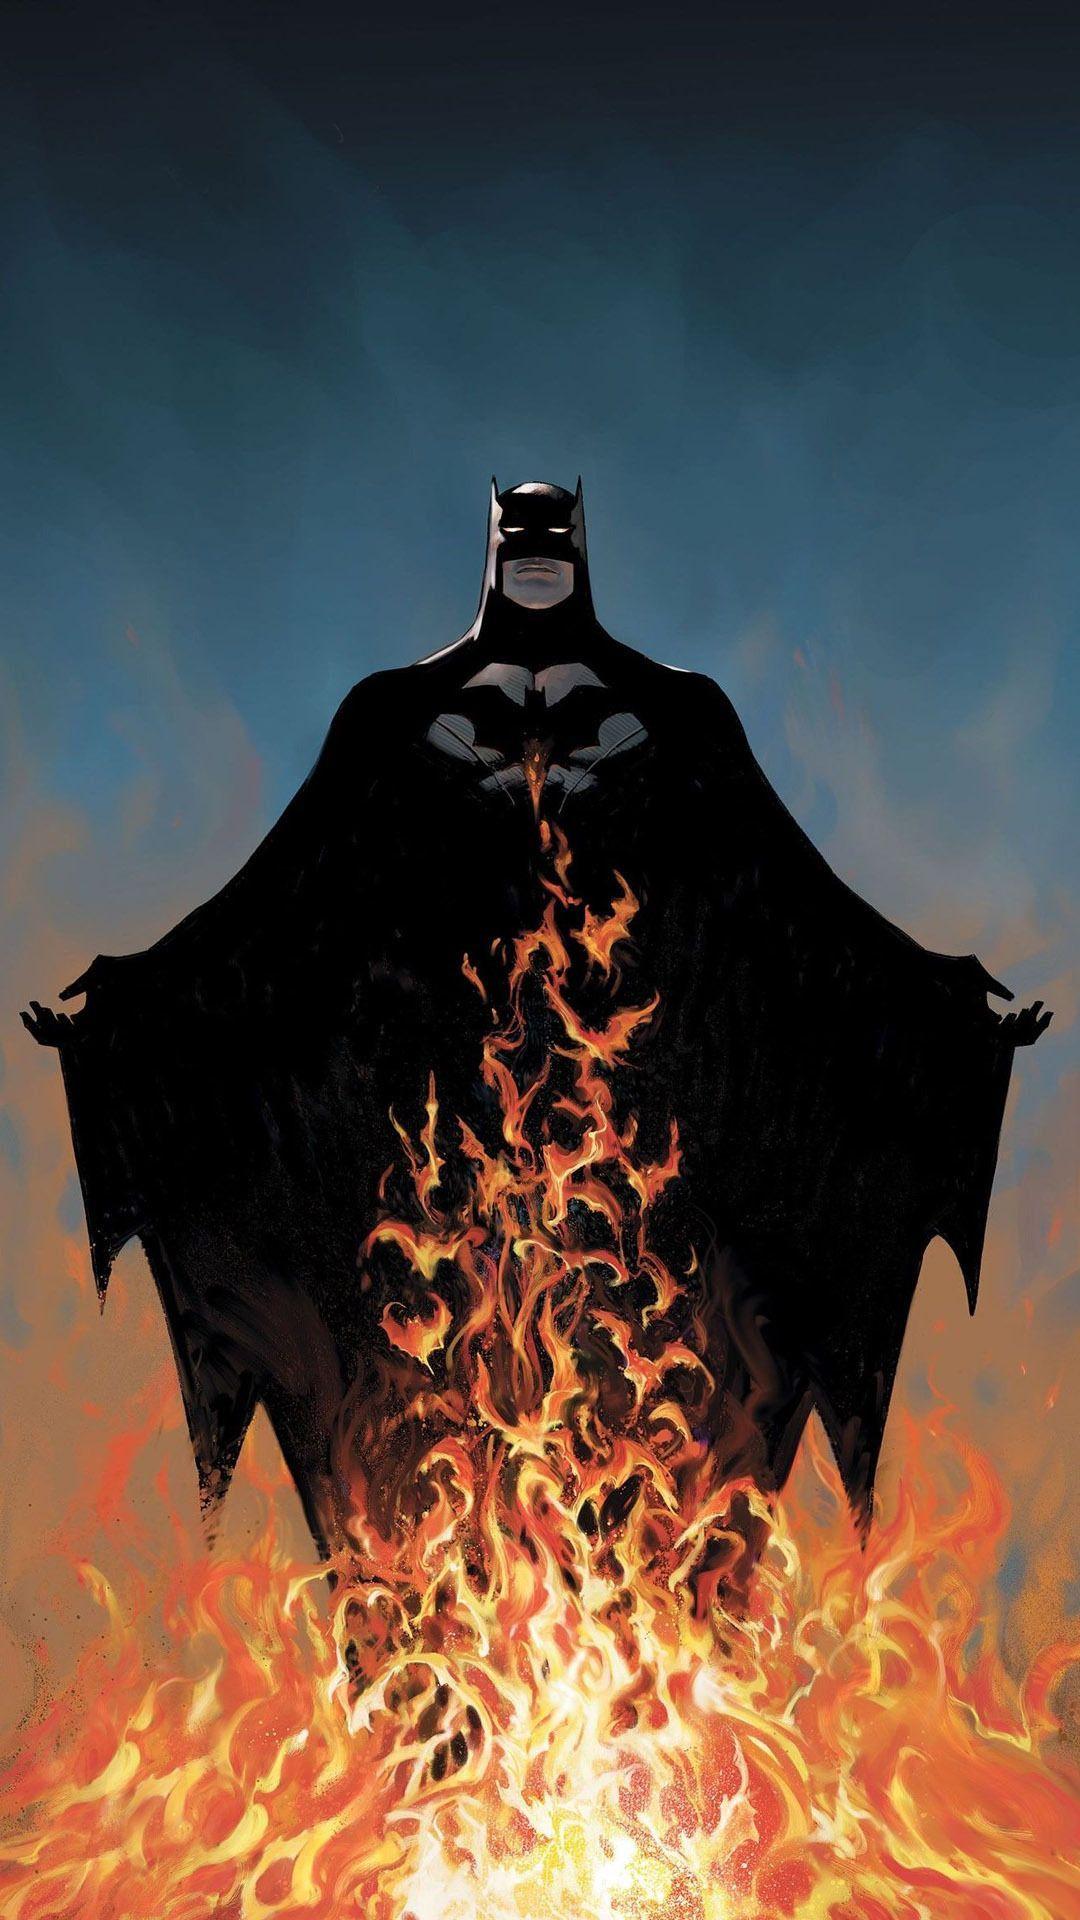 batman wallpaper hd for android